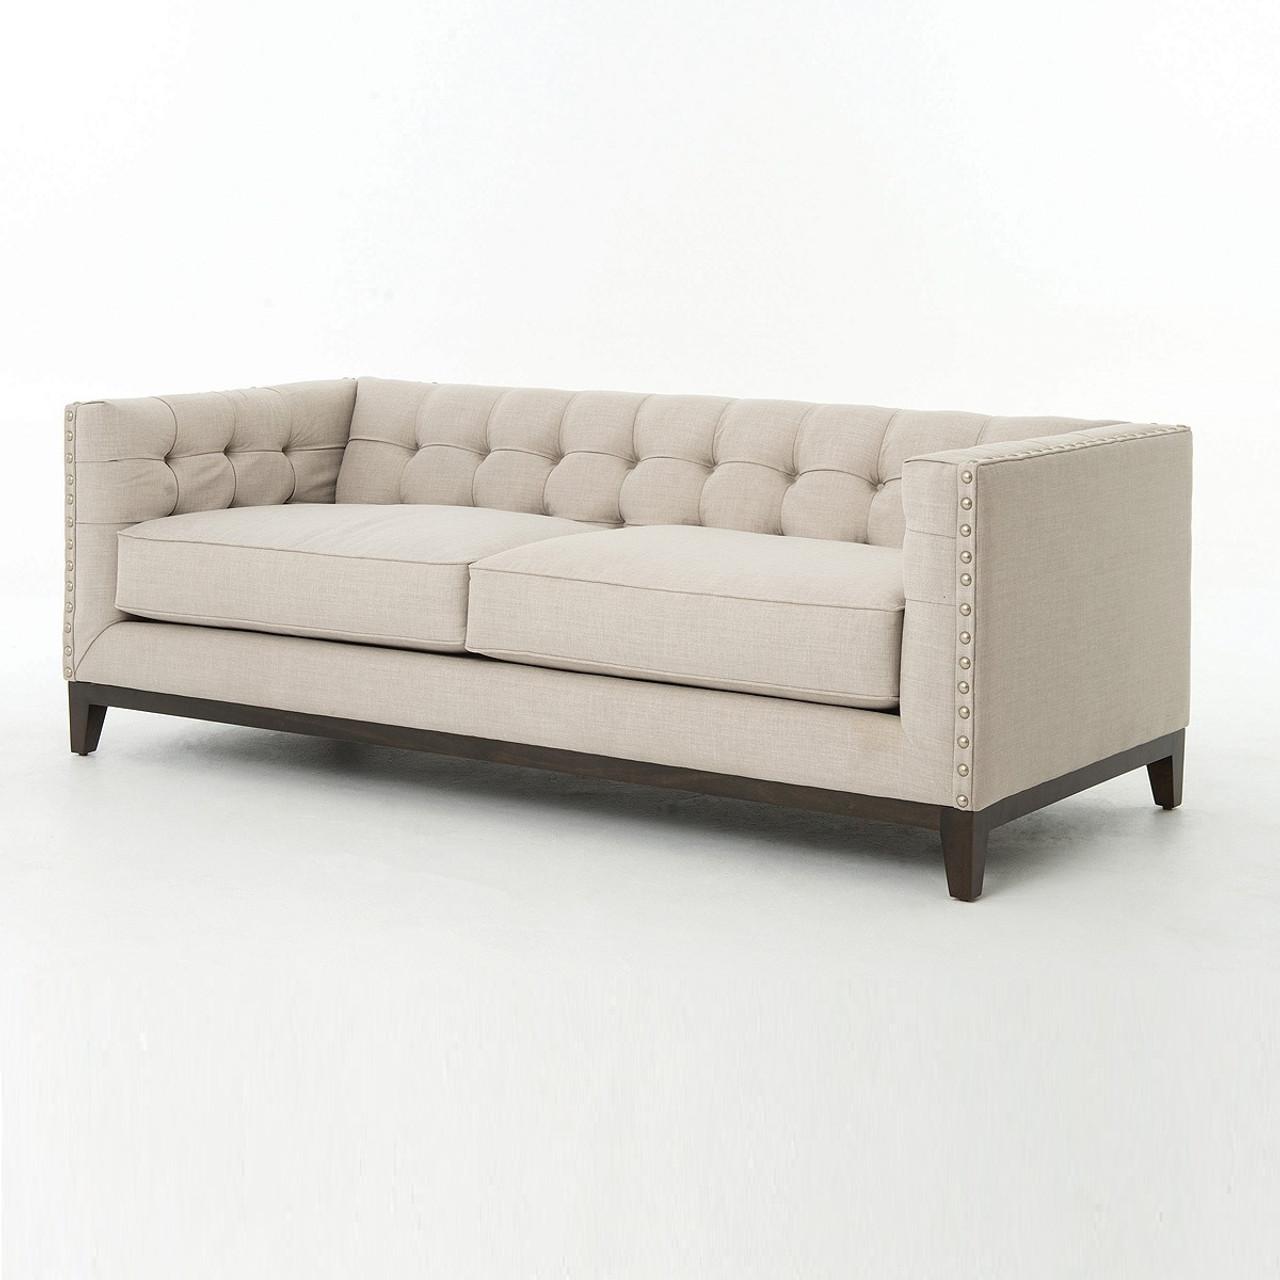 Lovely Greenwich Modern Tufted Linen Sofa. Atelier Greenwich Nailhead Sofa